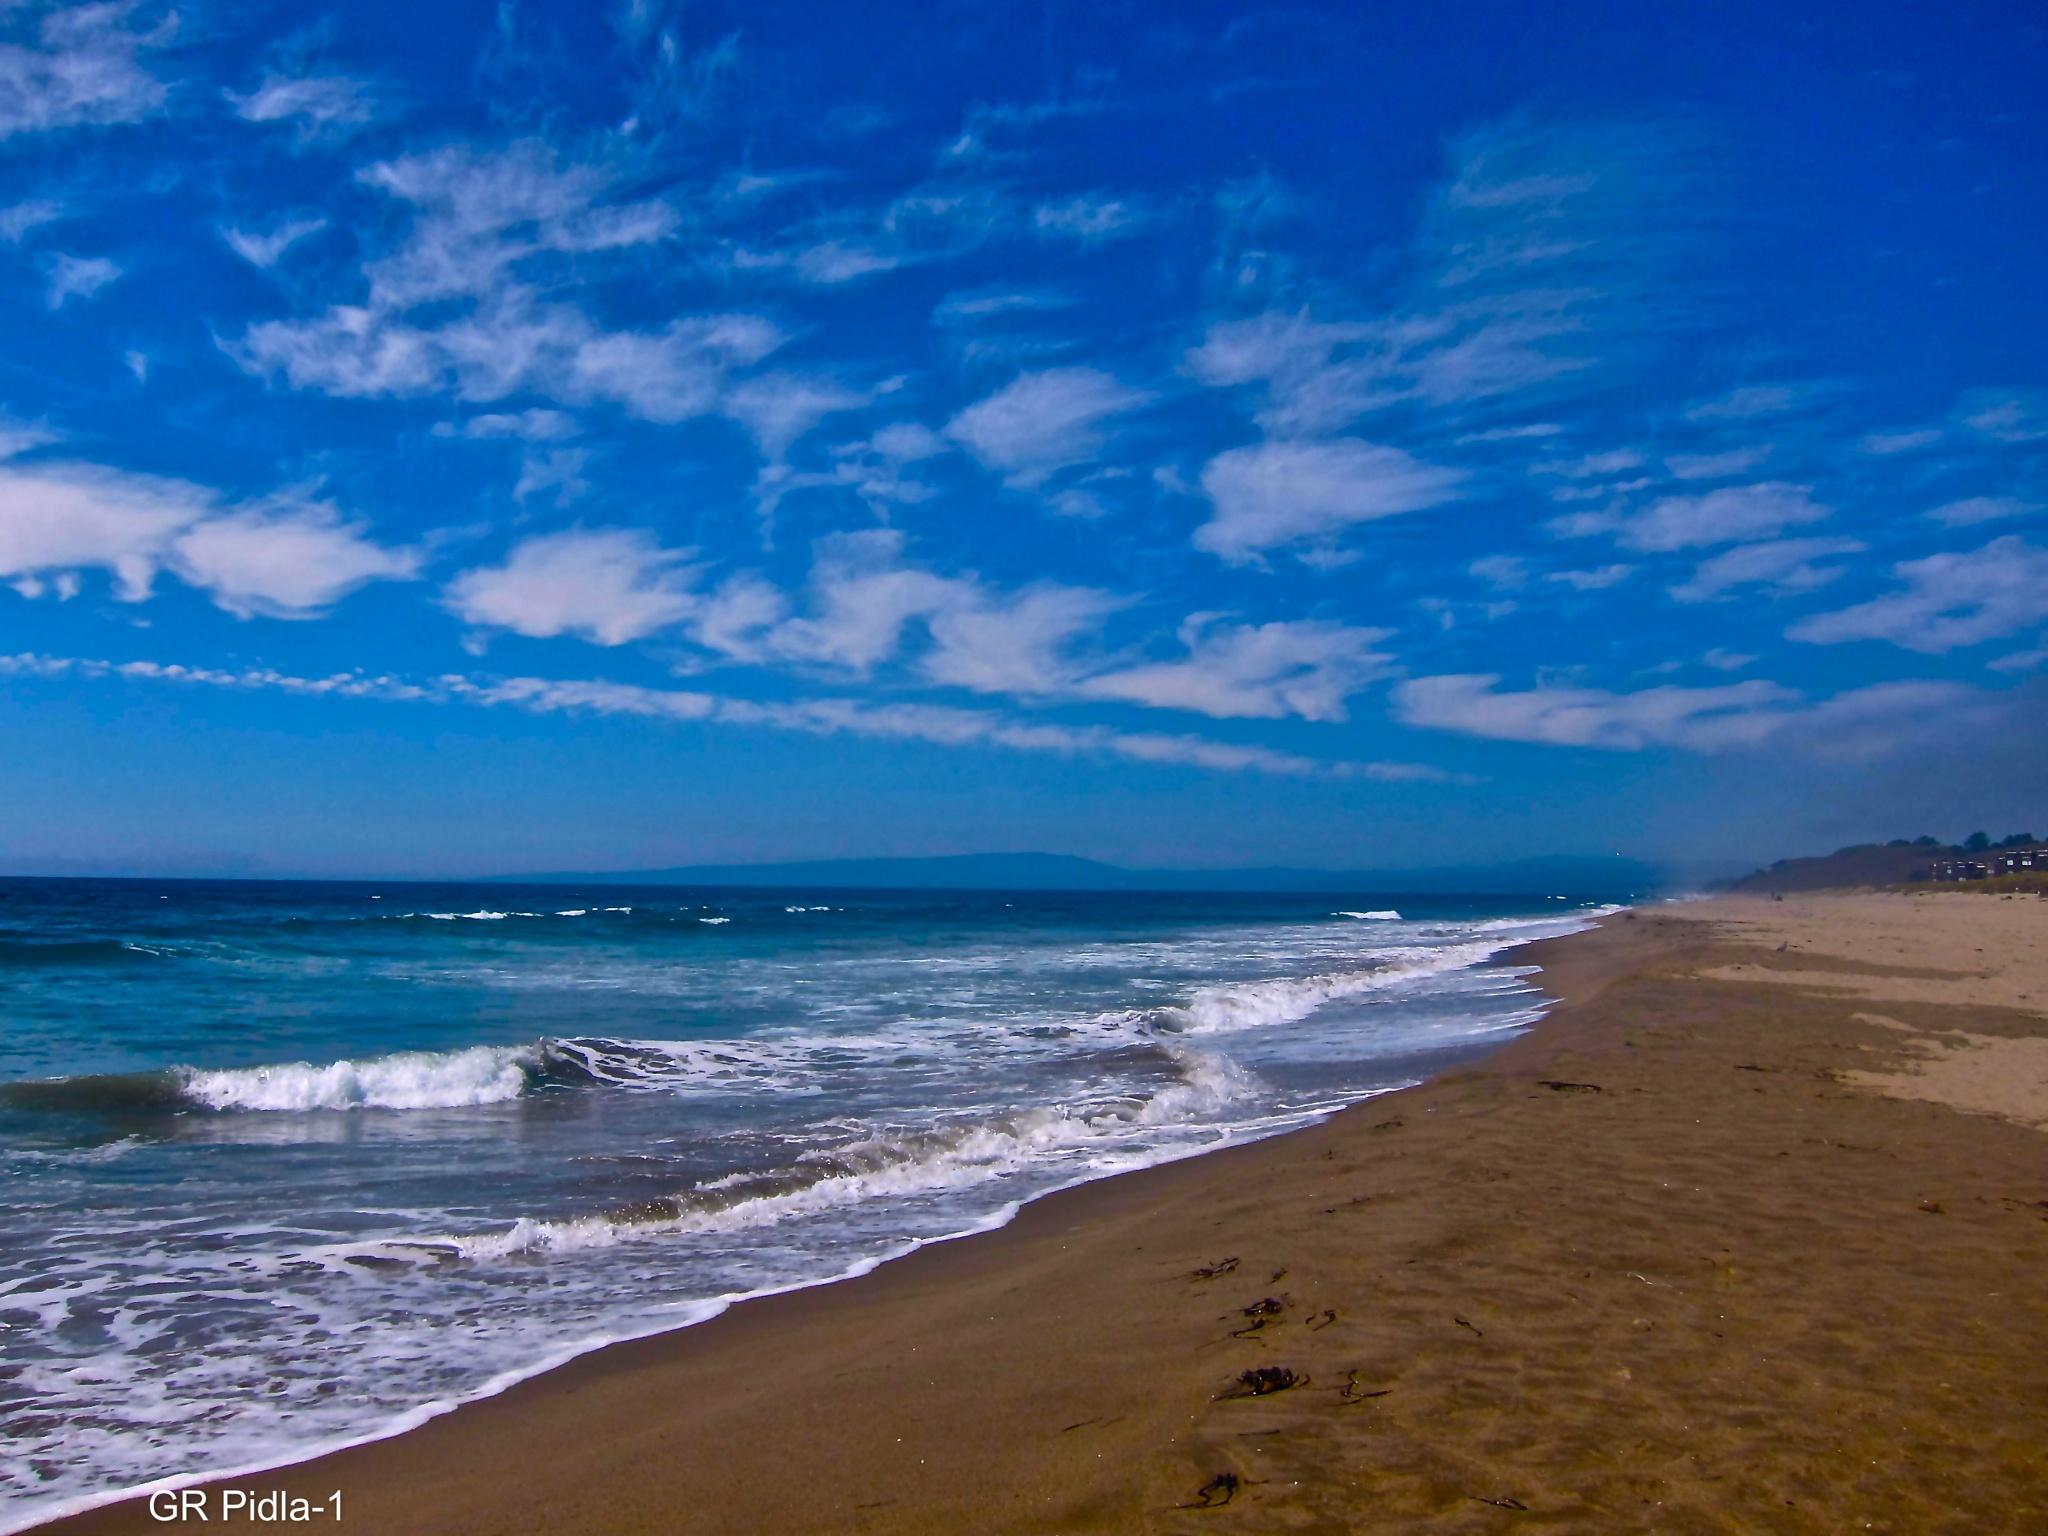 Calm & Quiet at the beach by Gina  Alwaysmile (*_*)